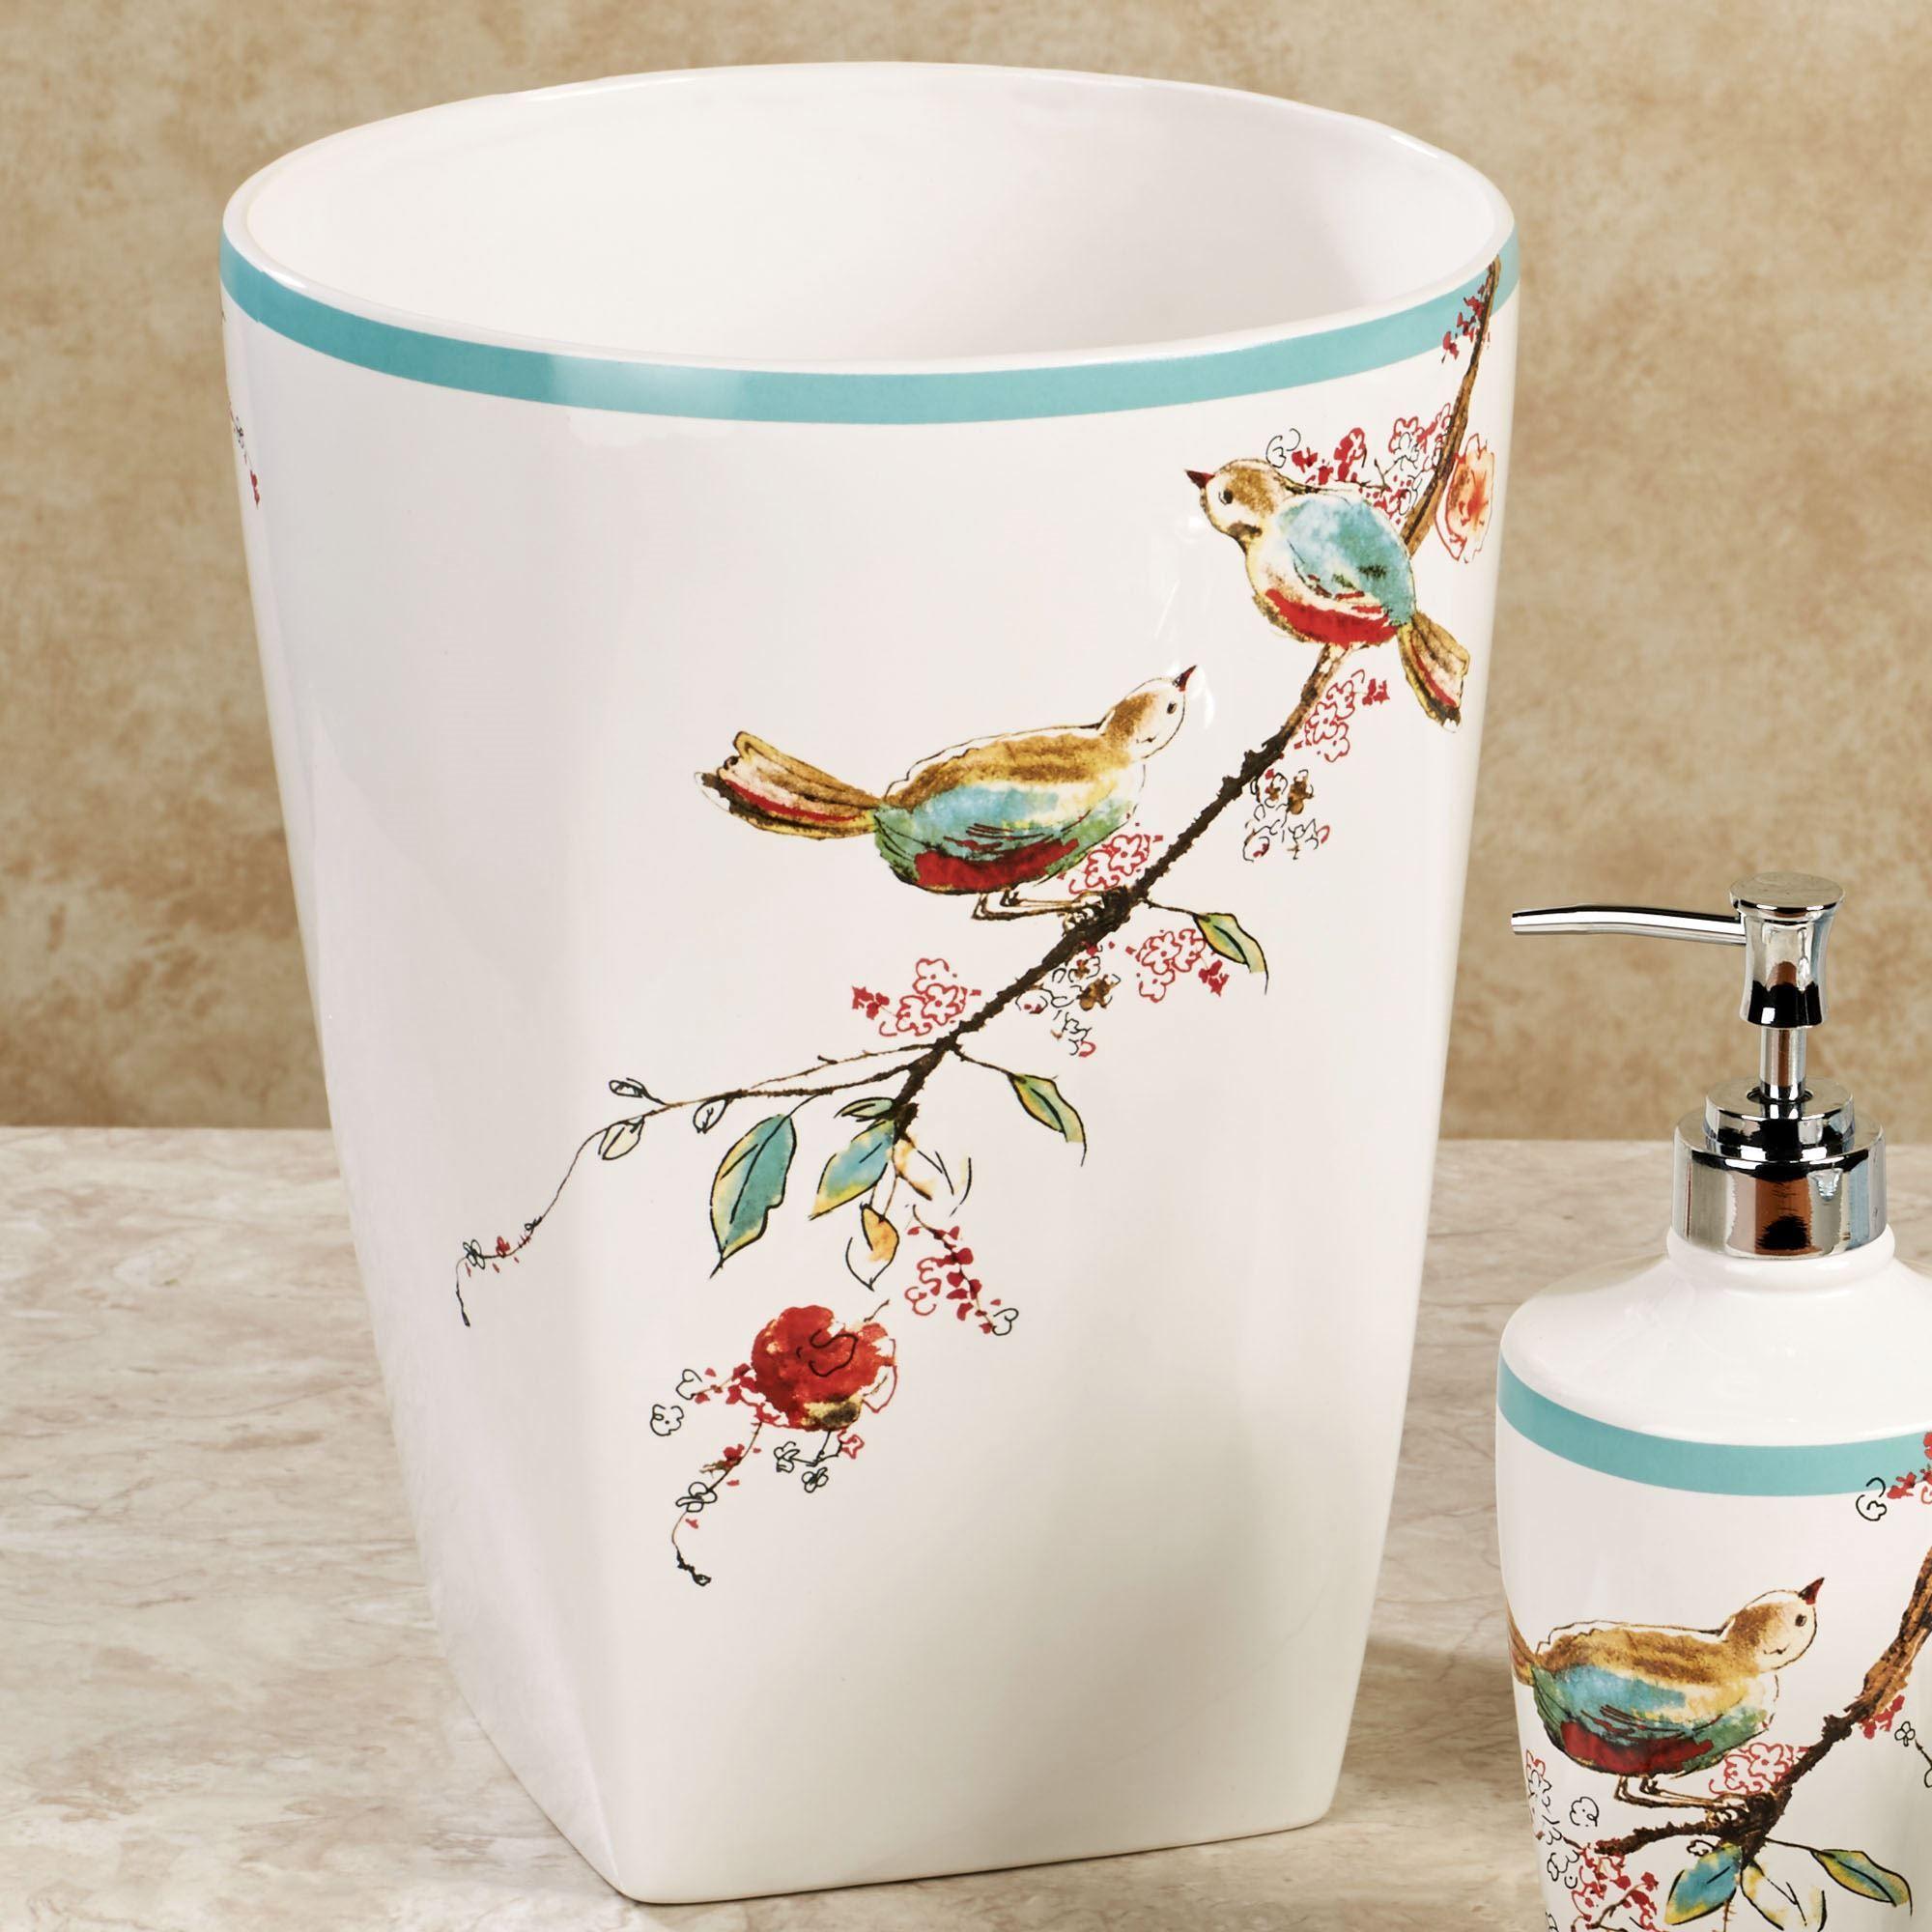 Lenox Chirp Wastebasket White Lenox Simply Fine Bath Accessories Chirp Shower Curtain Best